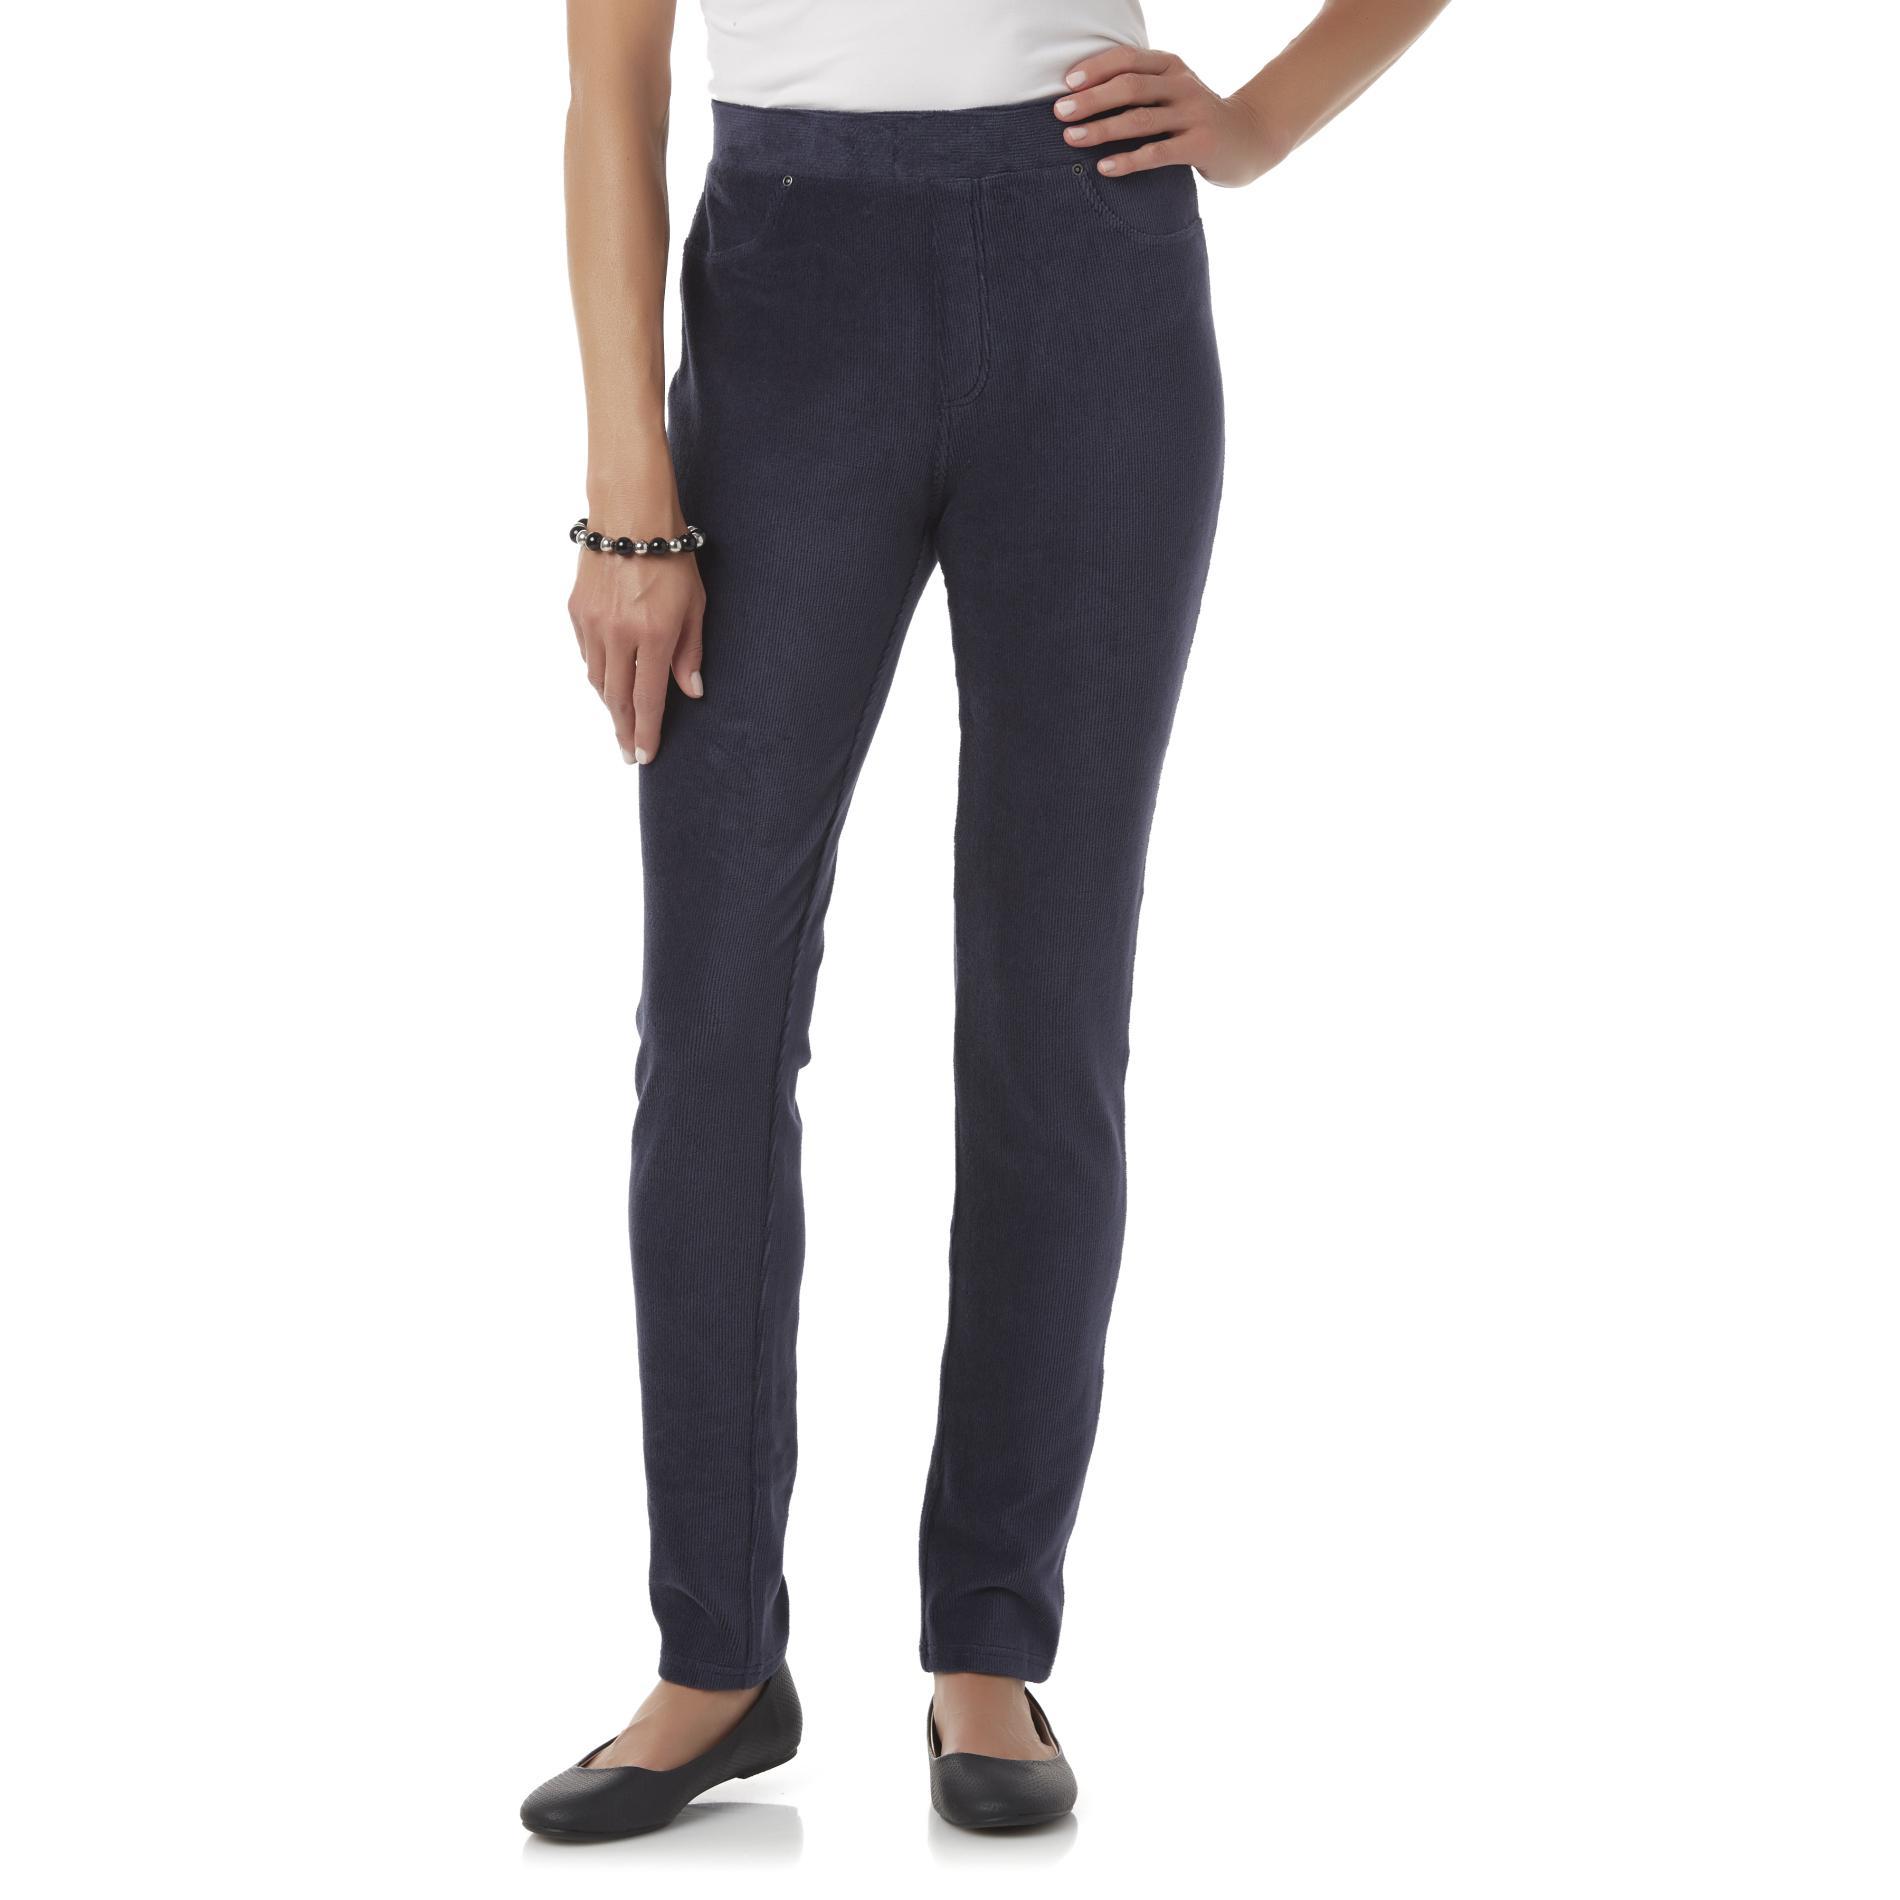 Basic Editions Women' Corduroy Leggings - Kmart